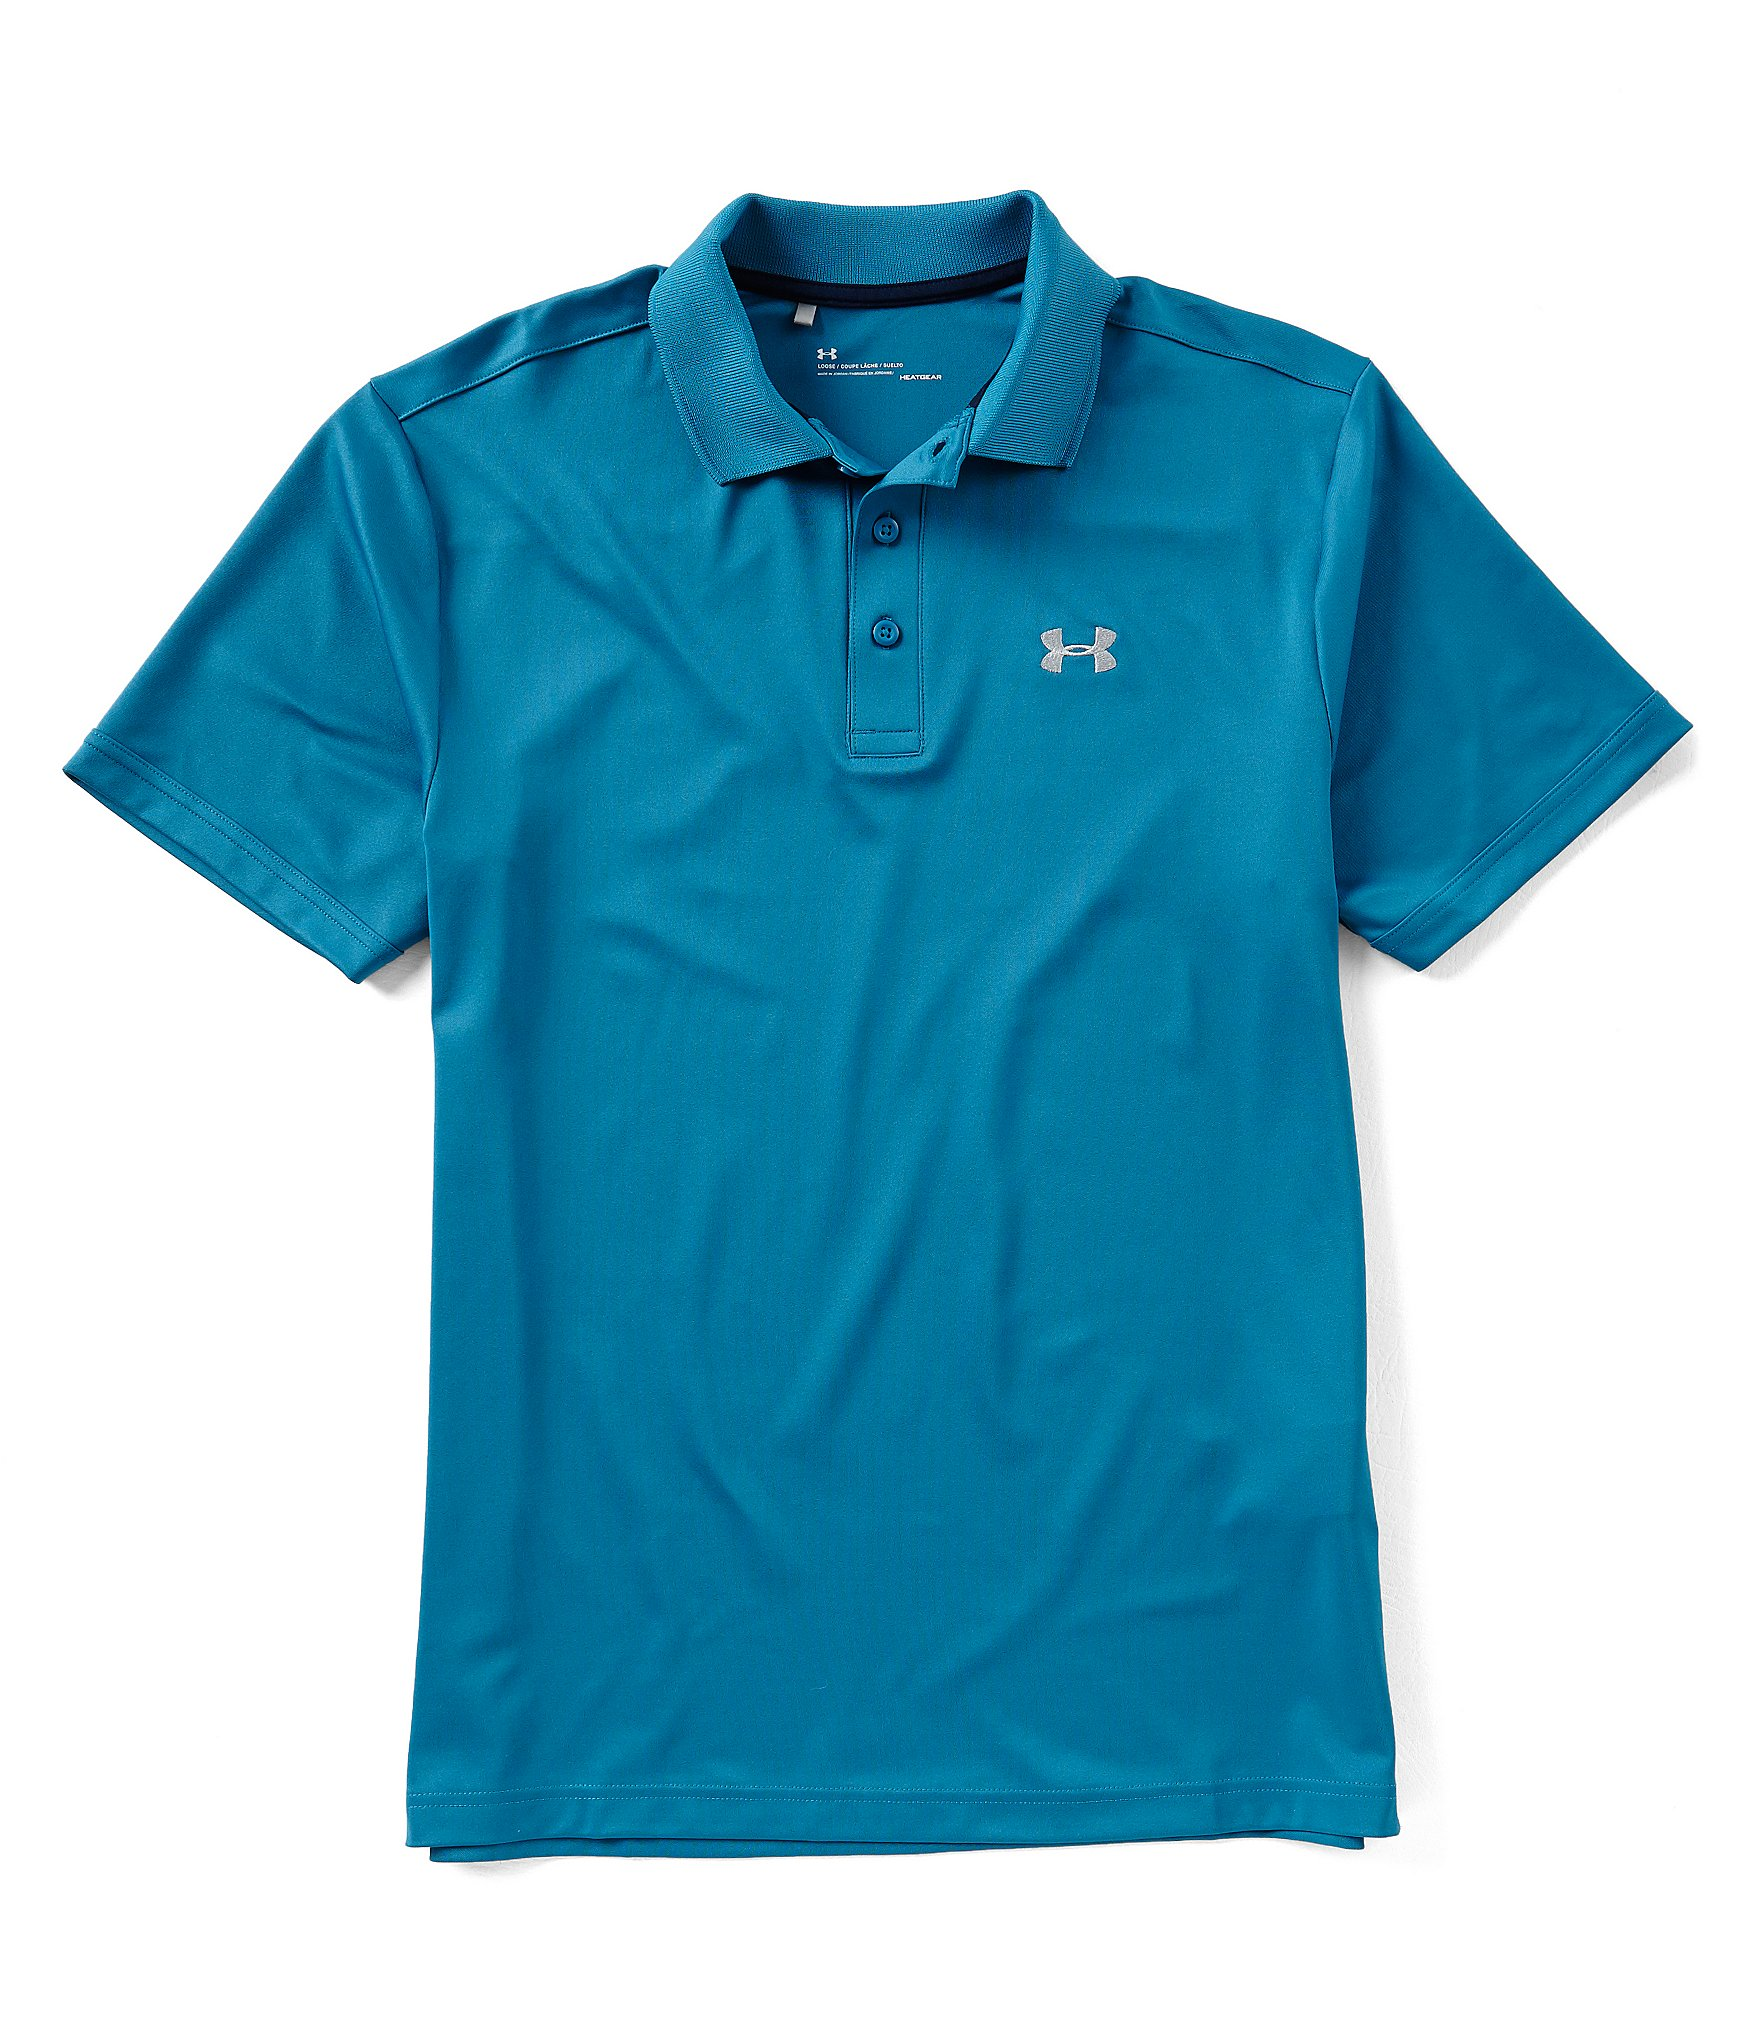 under armour golf performance golf polo shirt dillards